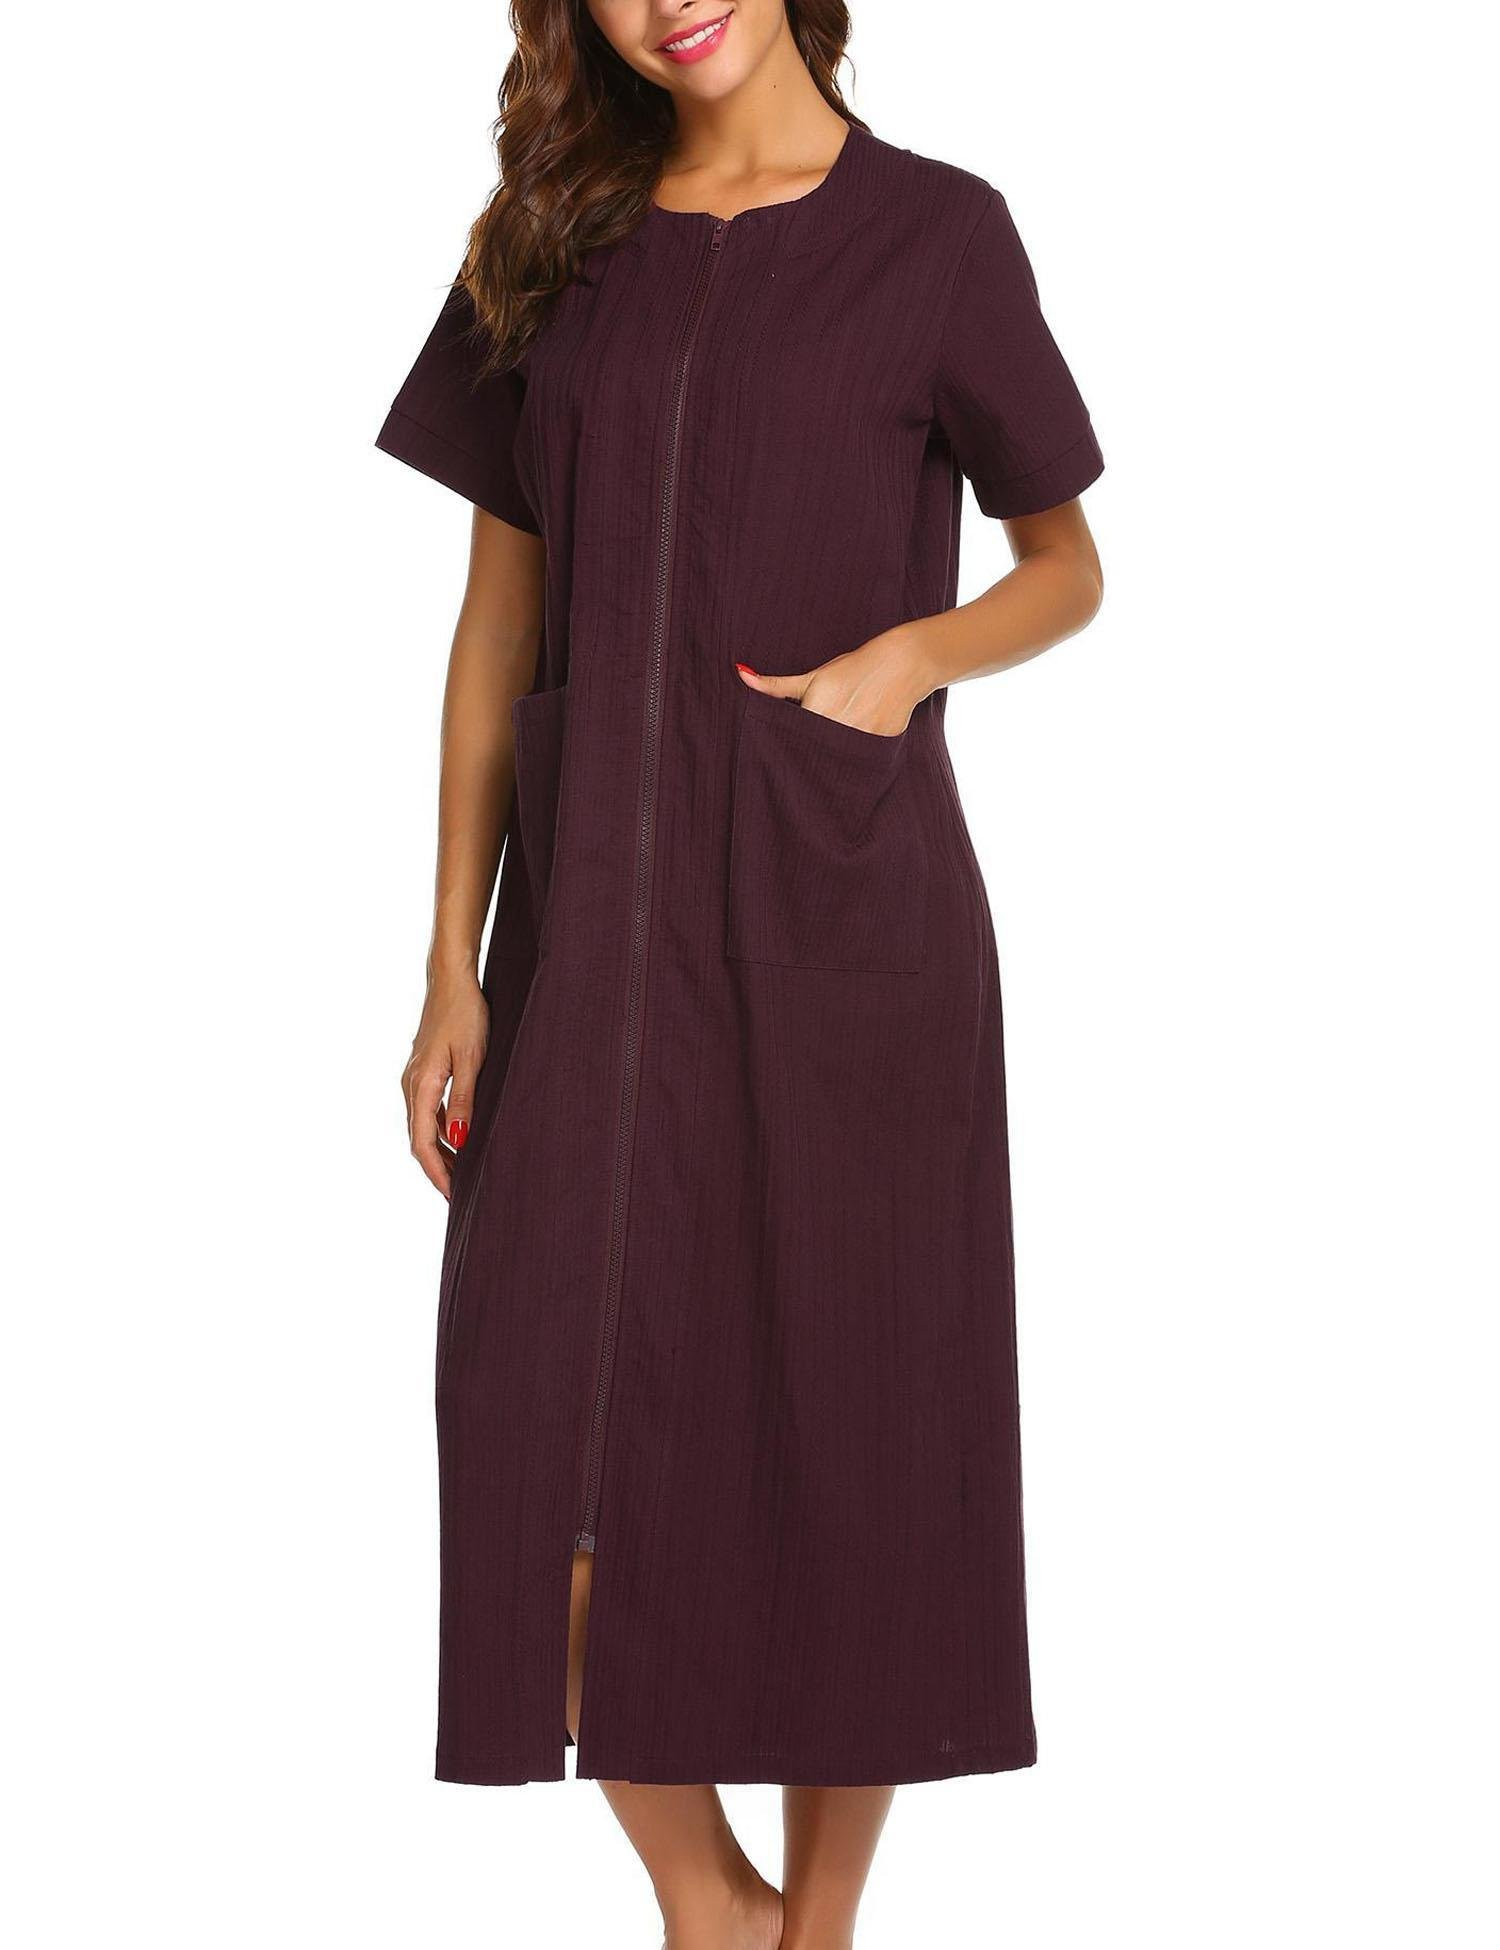 Vansop Classic Style Long Straight Zip-up Sleepwear Nightwear with Maximum Airflow